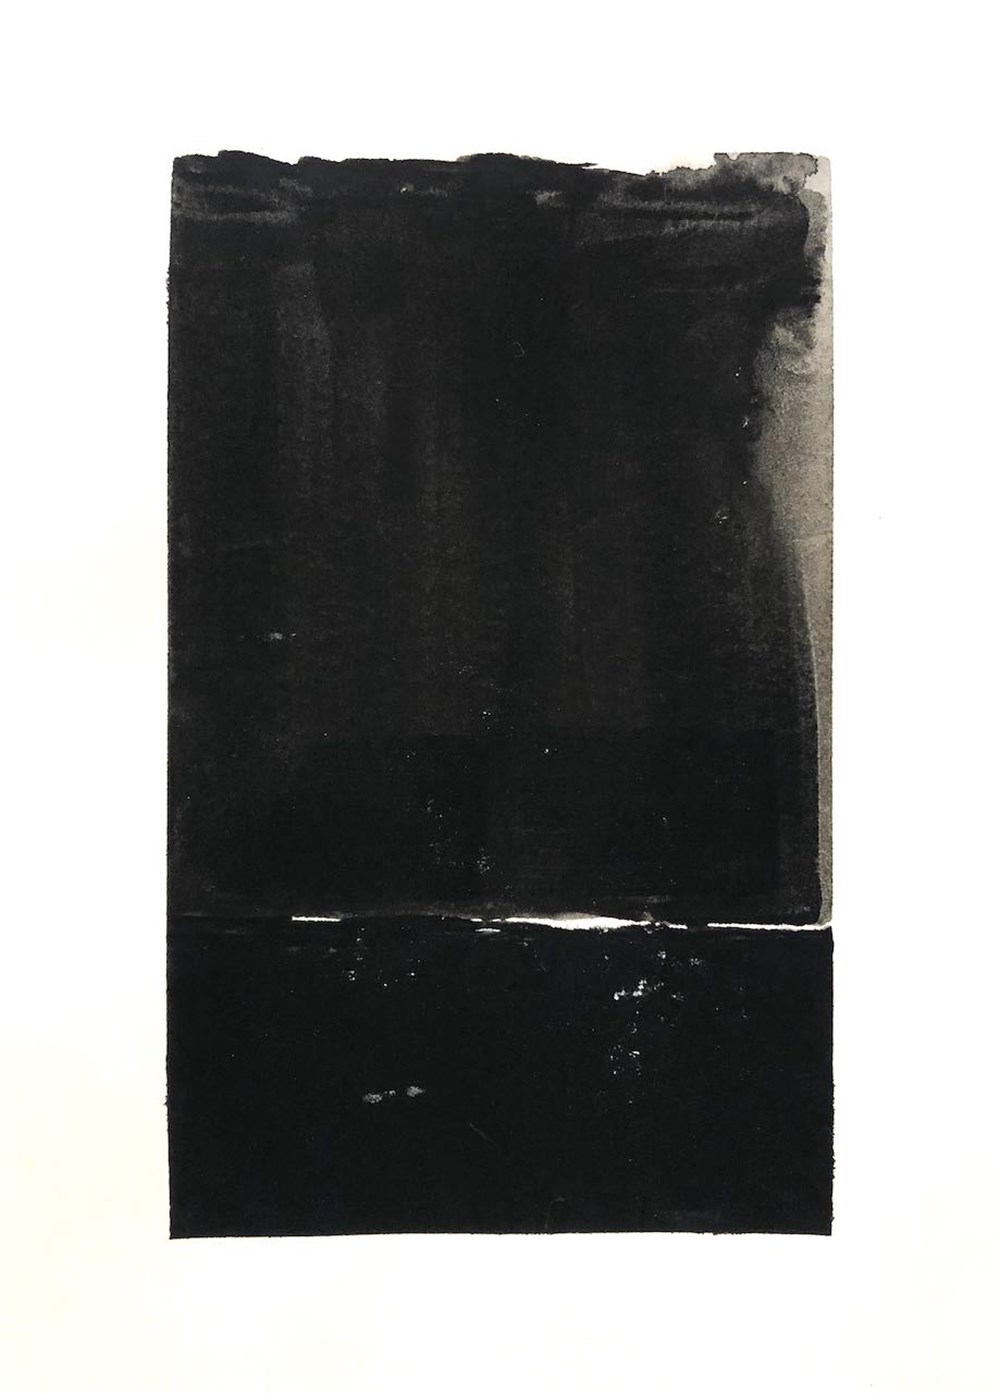 Life on Venus | The Landscape, Timed Auction - Lot 88, Stephanie Nebbia, Shift